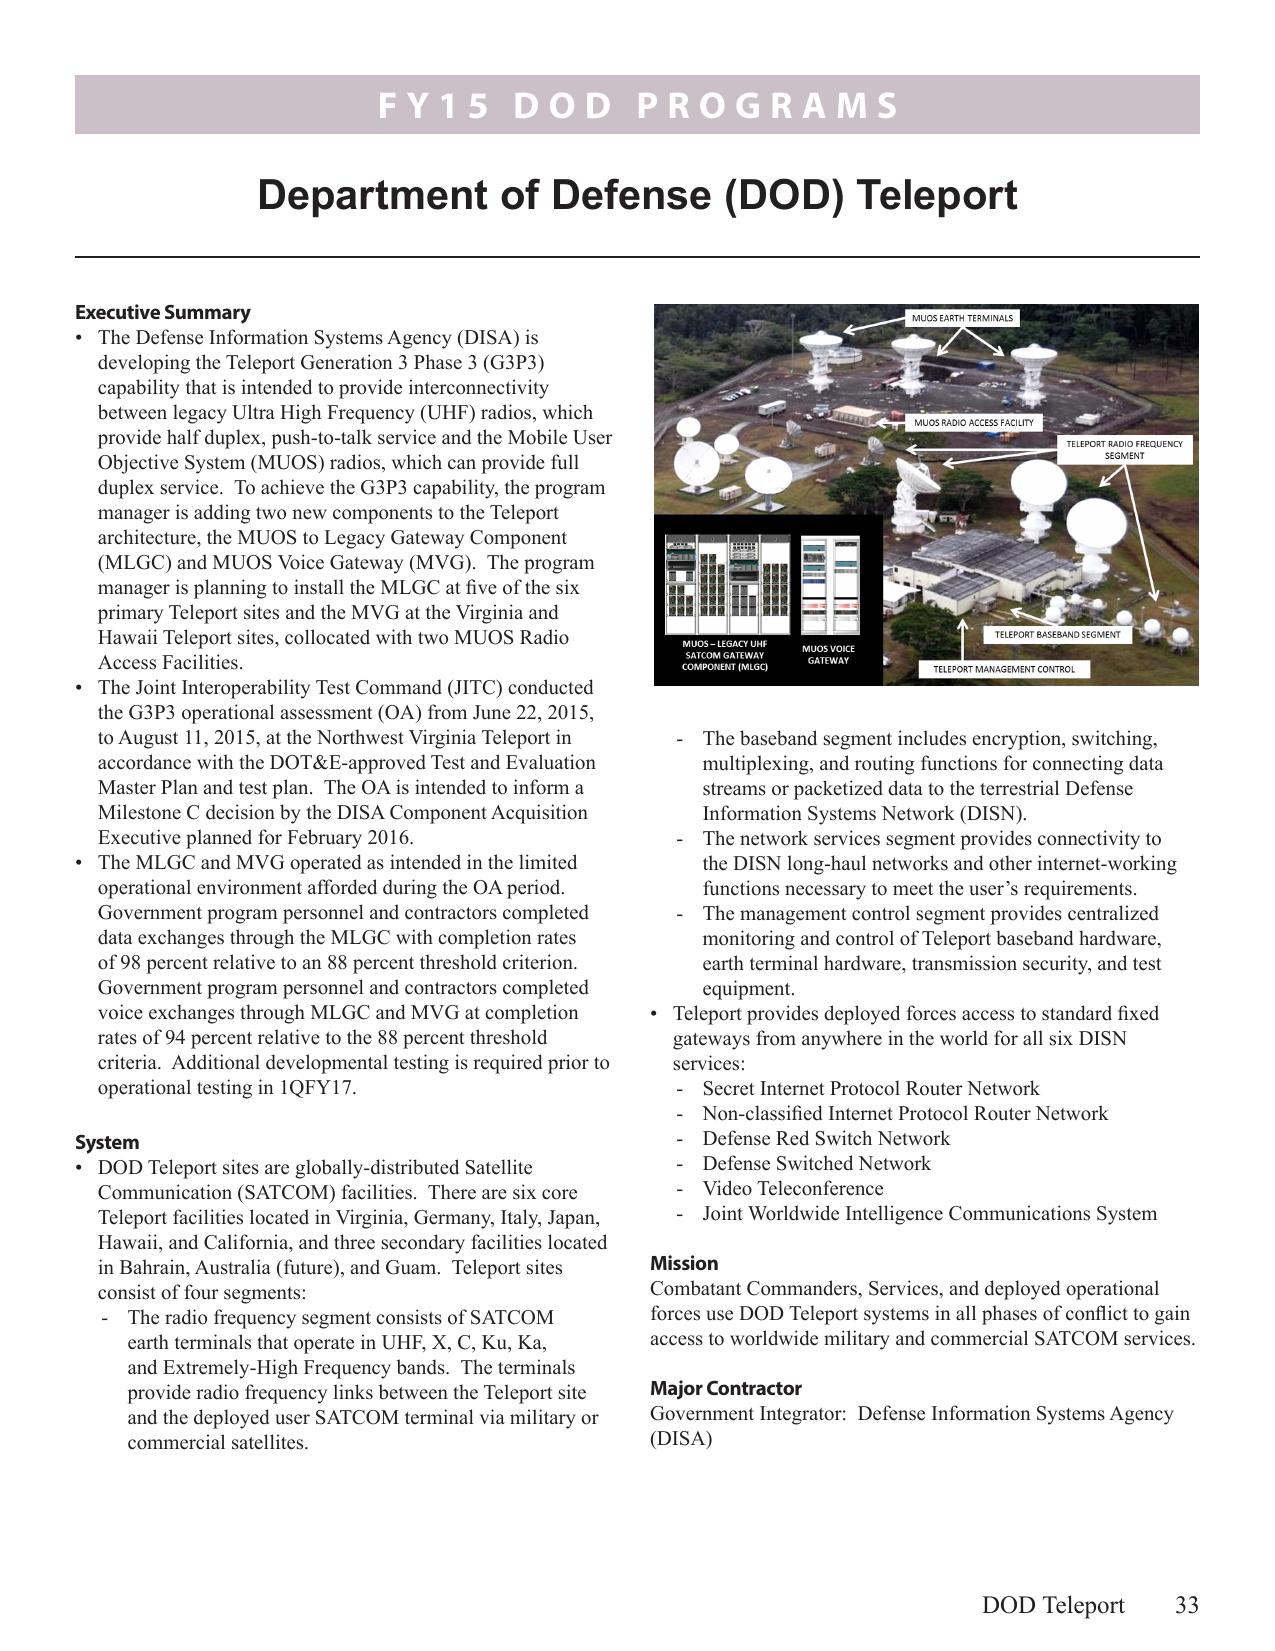 Department of Defense (DOD) Teleport